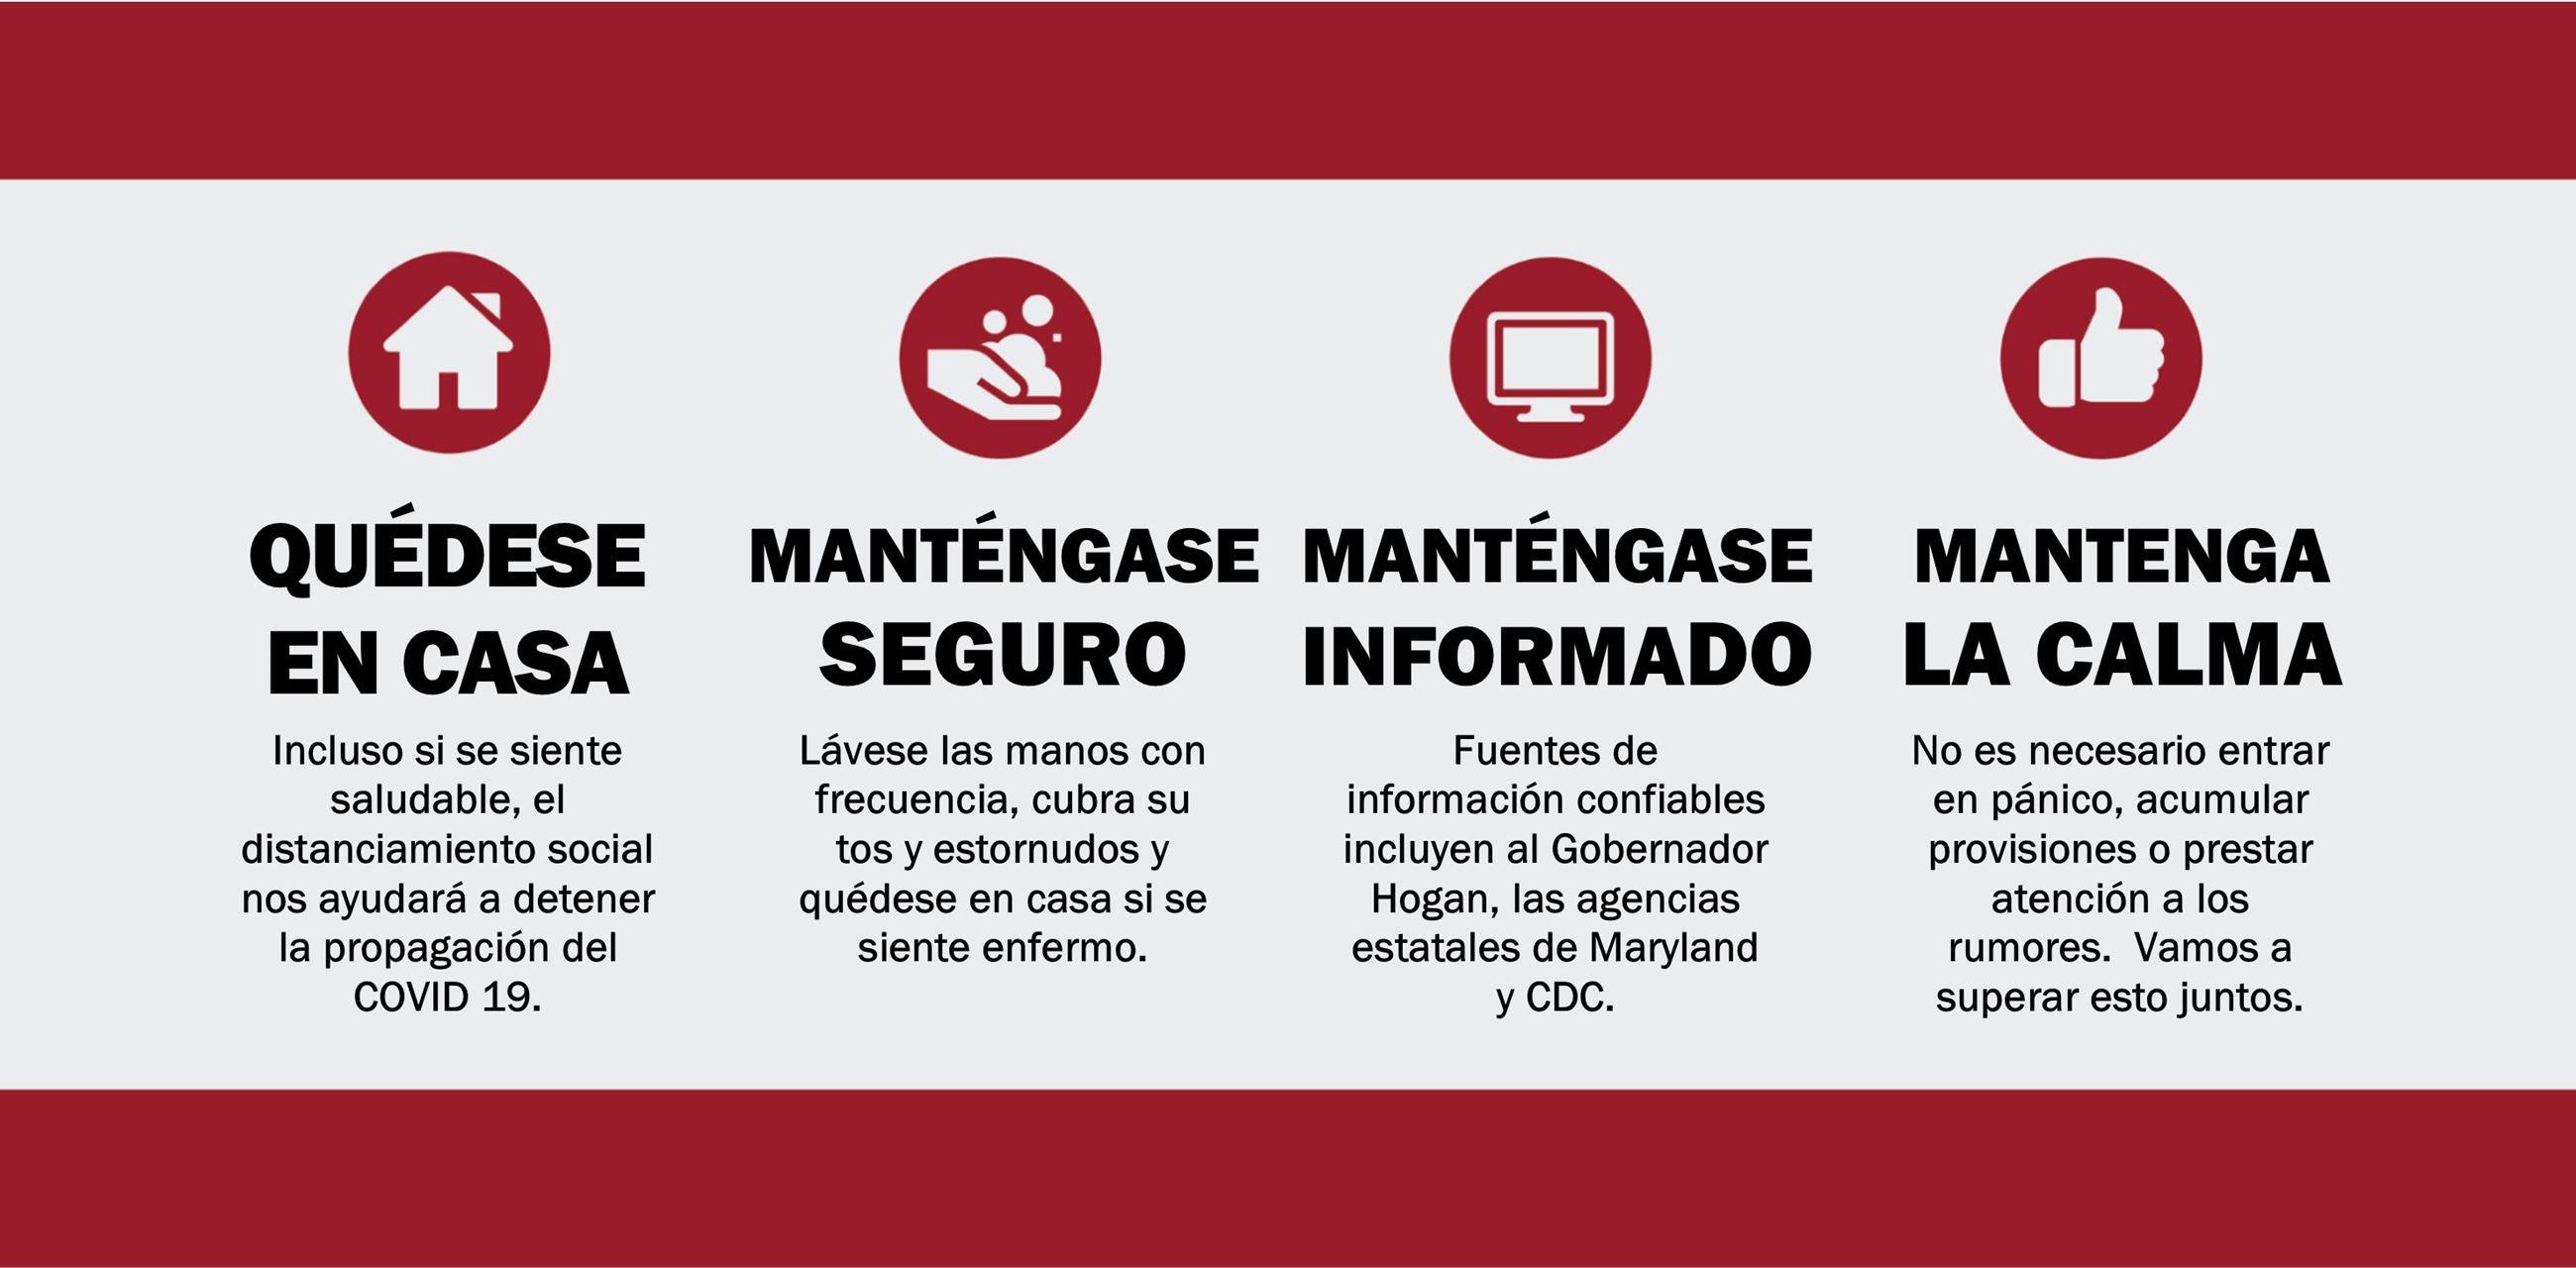 Stay PSA Spanish Opens in new window